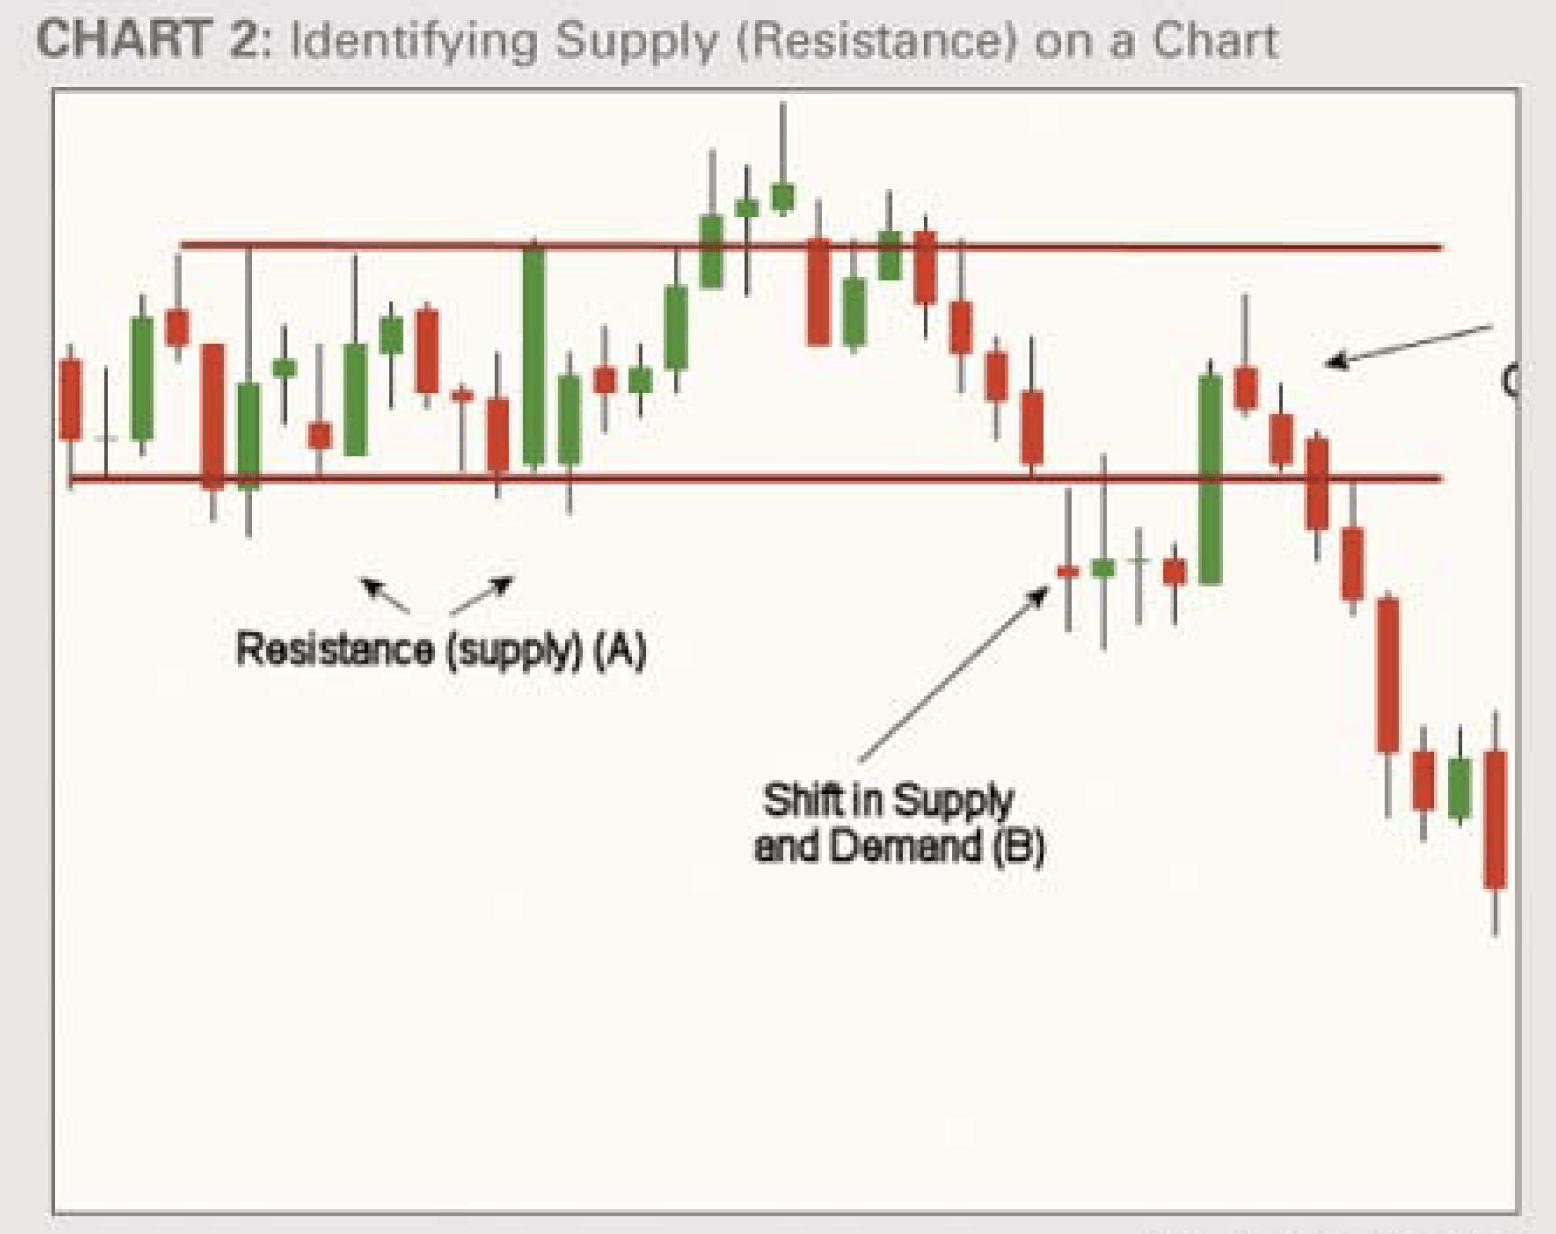 Supply Identification (Resistance)